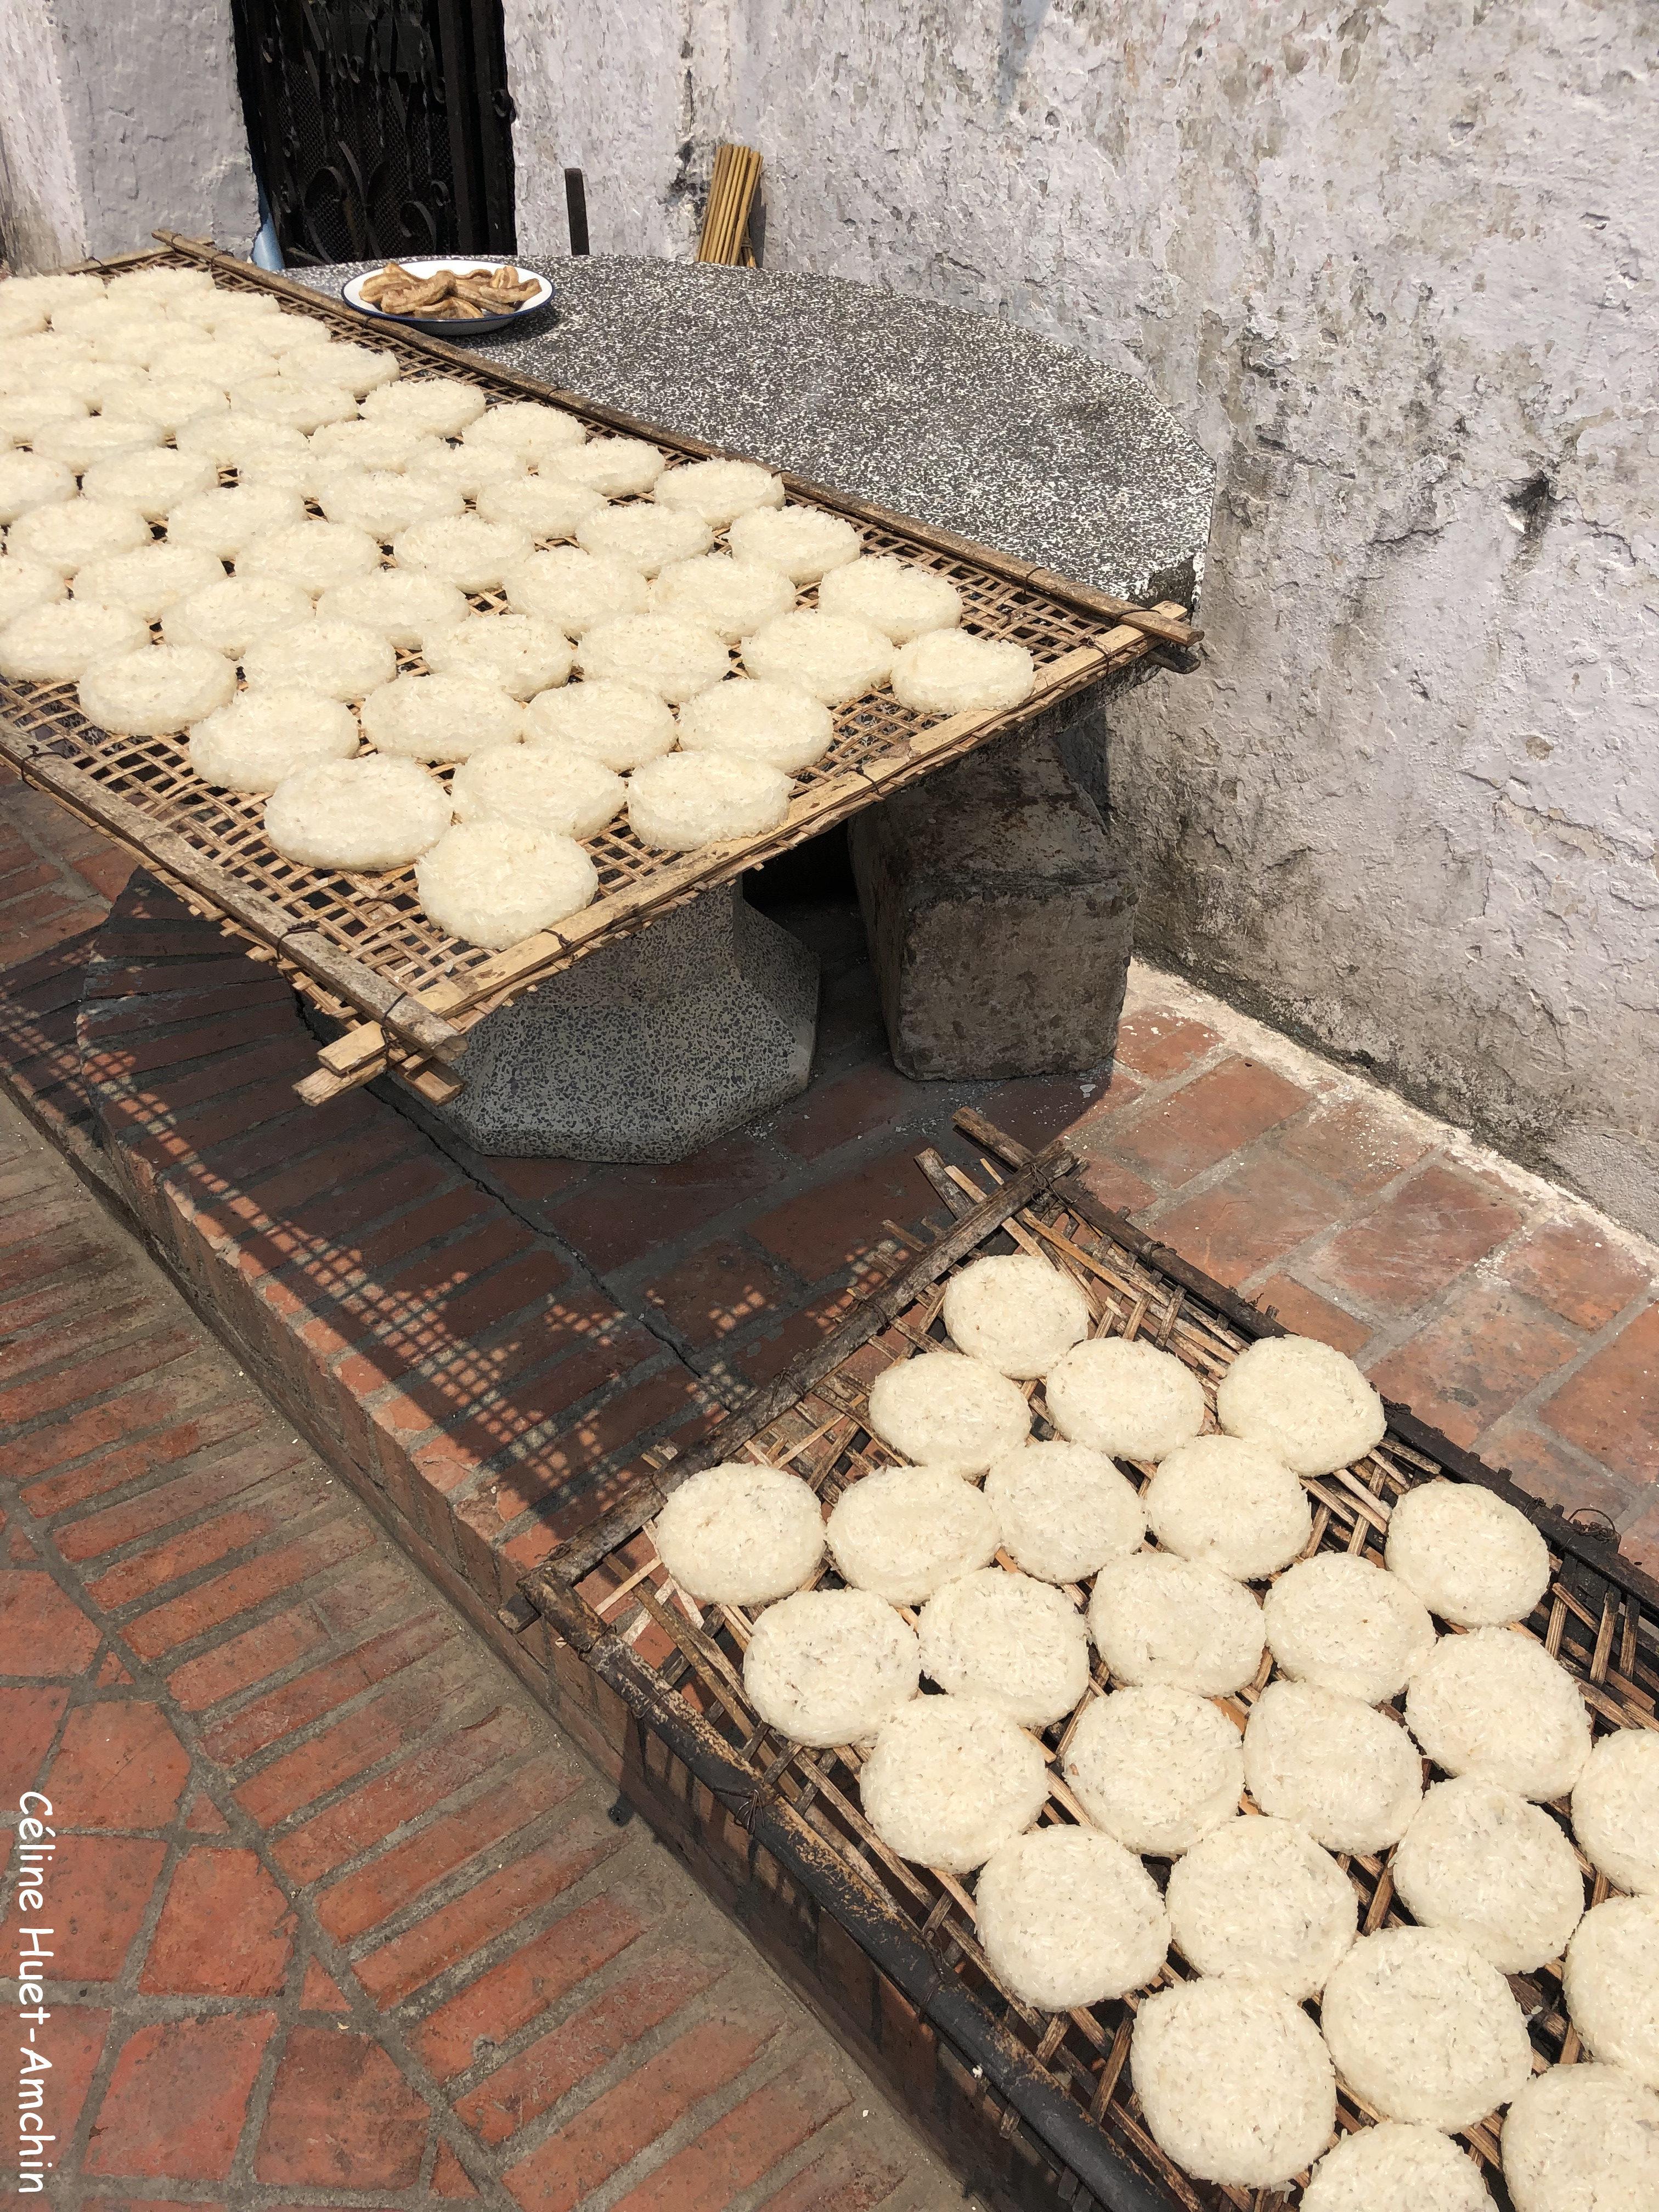 Riz qui sèche au soleil Luang Prabang Laos Asie